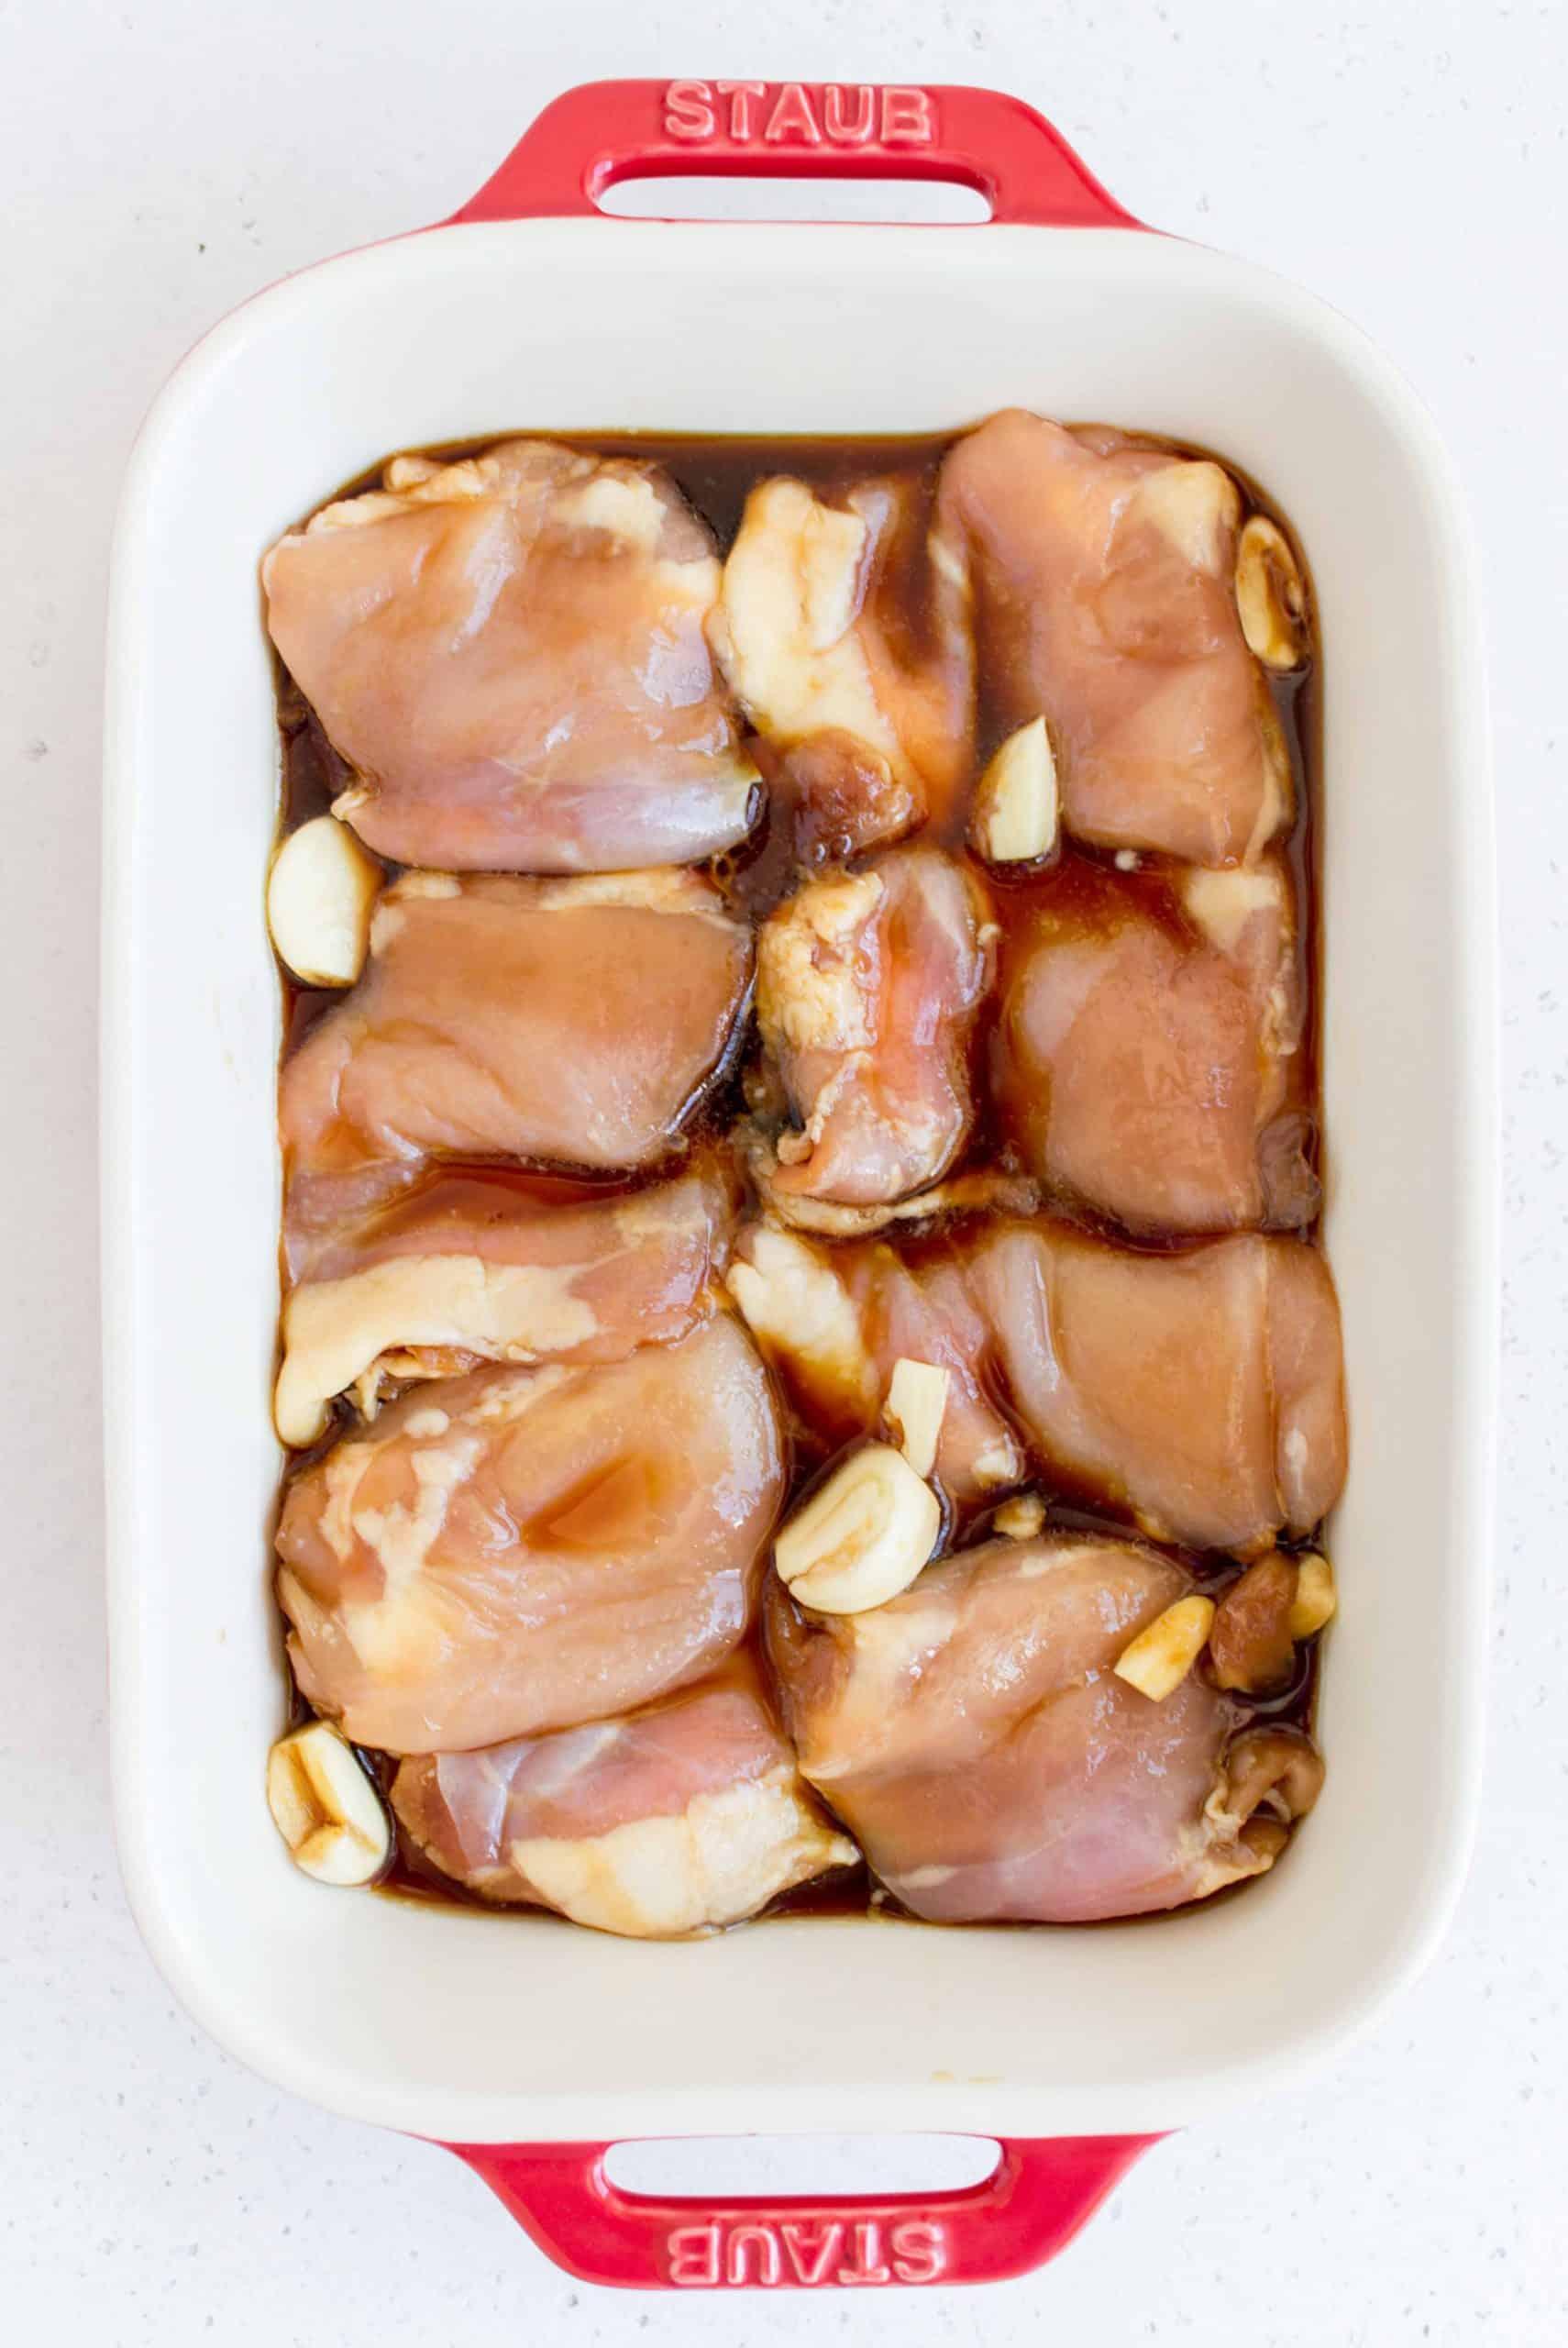 chicken thighs in a baking dish